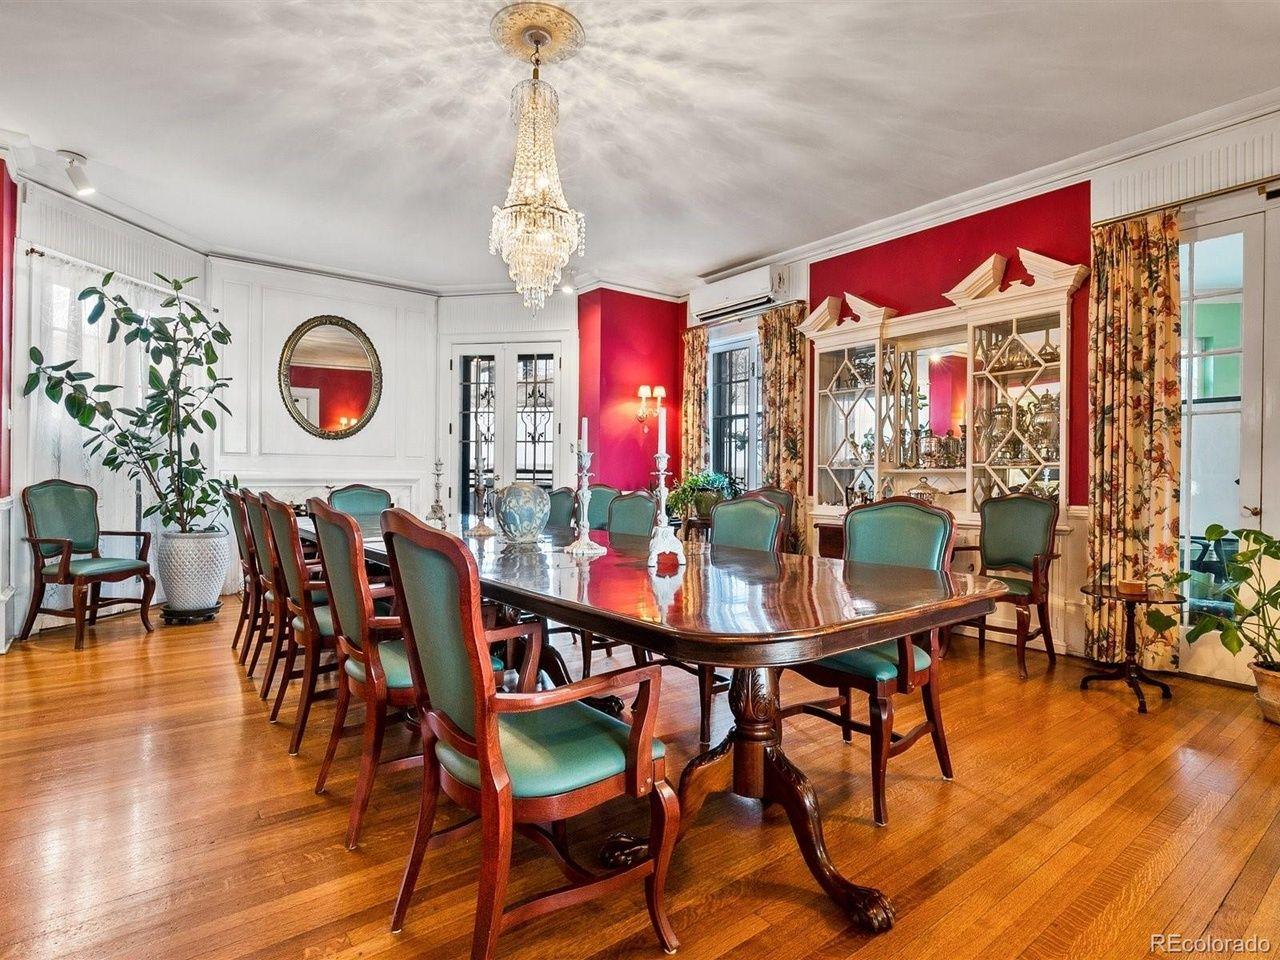 1350 N. Logan St dining room